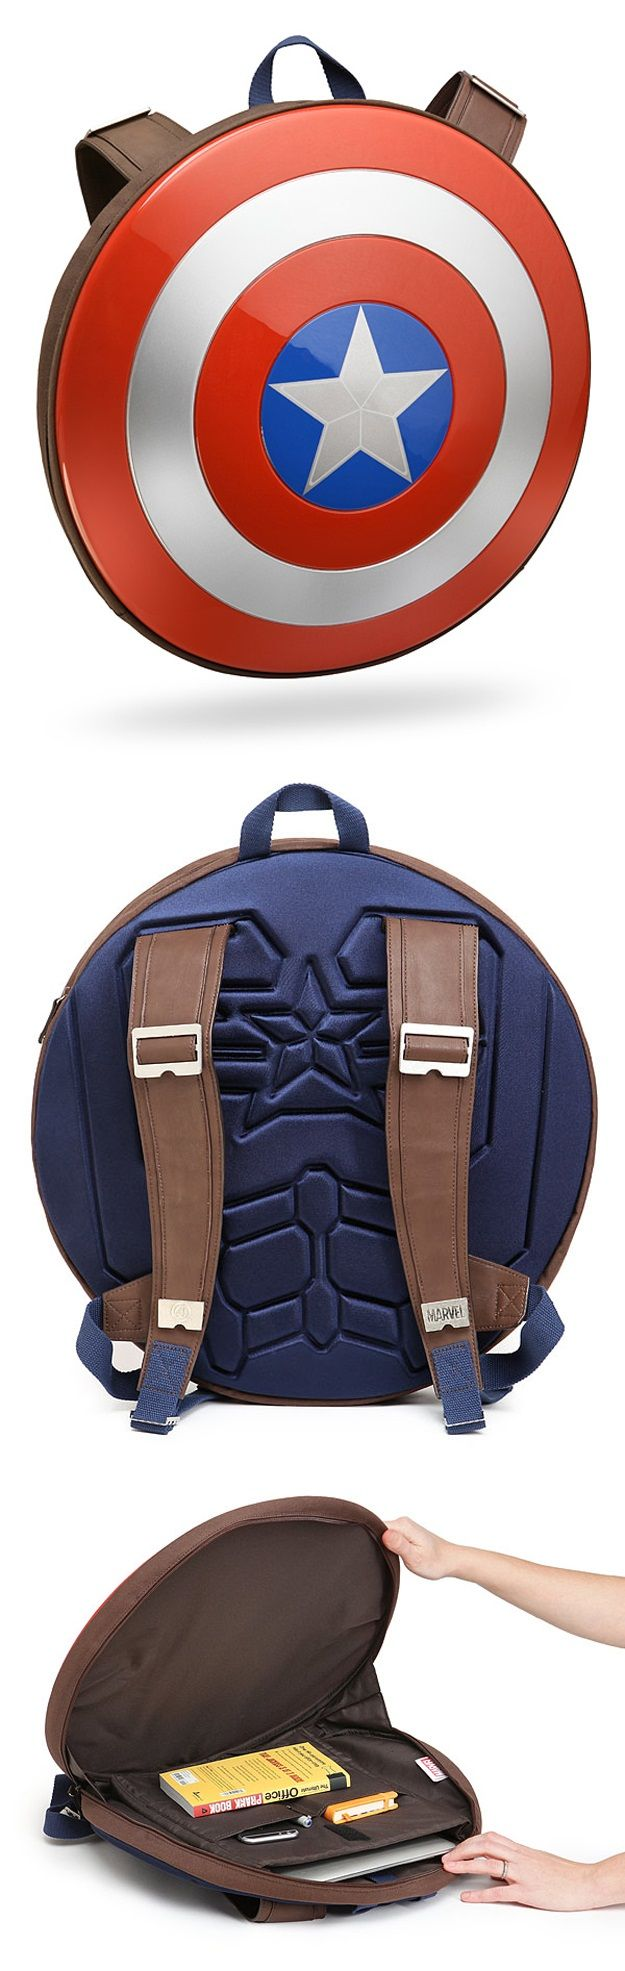 captain america shield backpack marvel pinterest comic captain america und kleidung. Black Bedroom Furniture Sets. Home Design Ideas